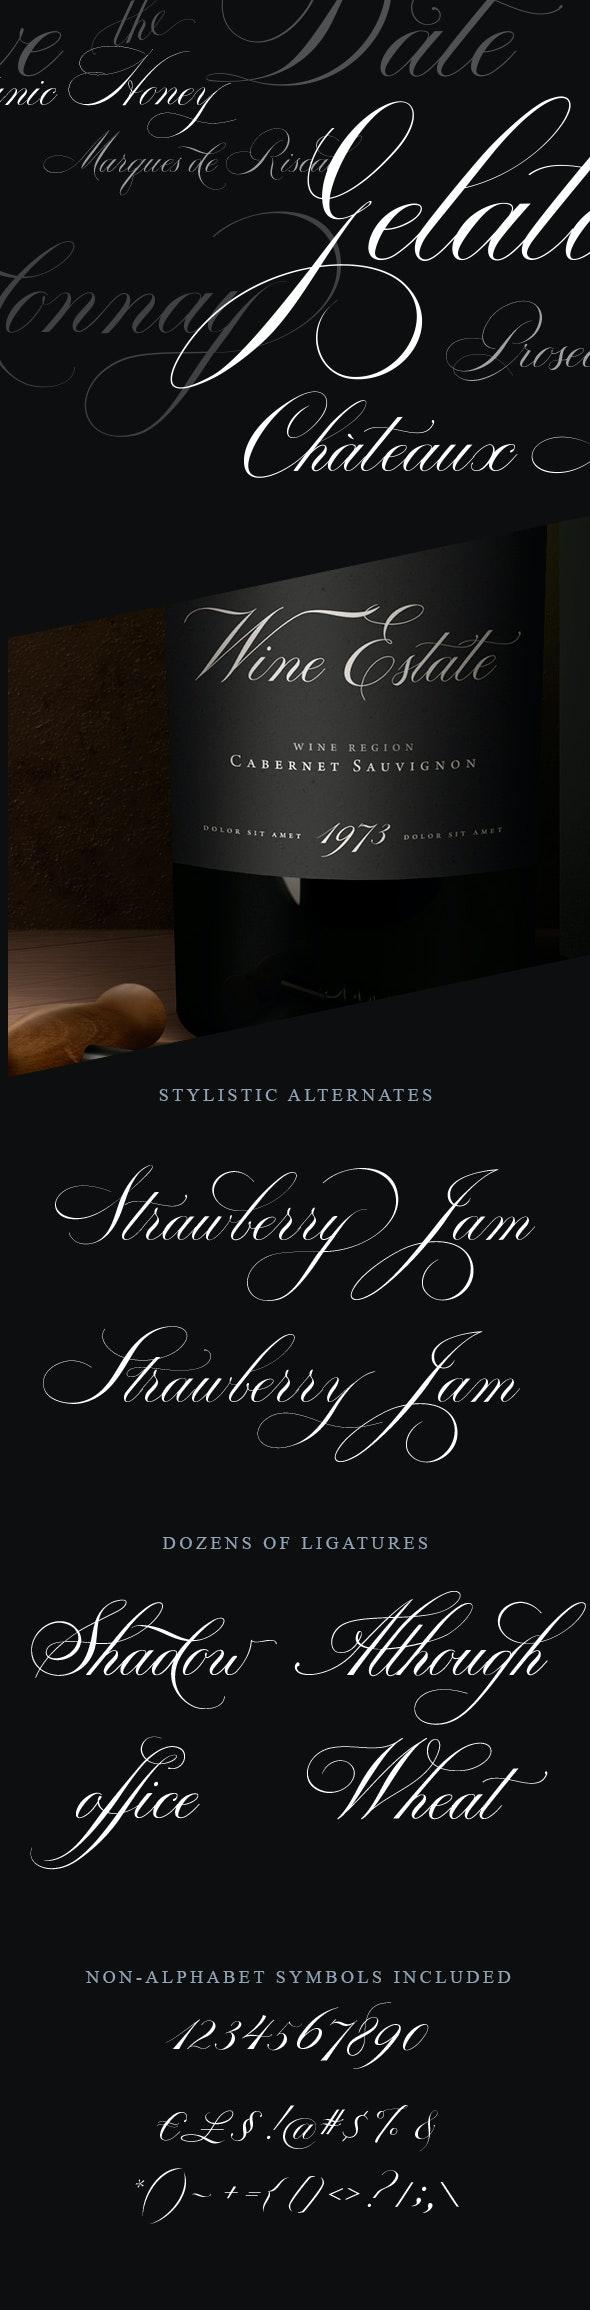 Bodega Script - Calligraphy Script